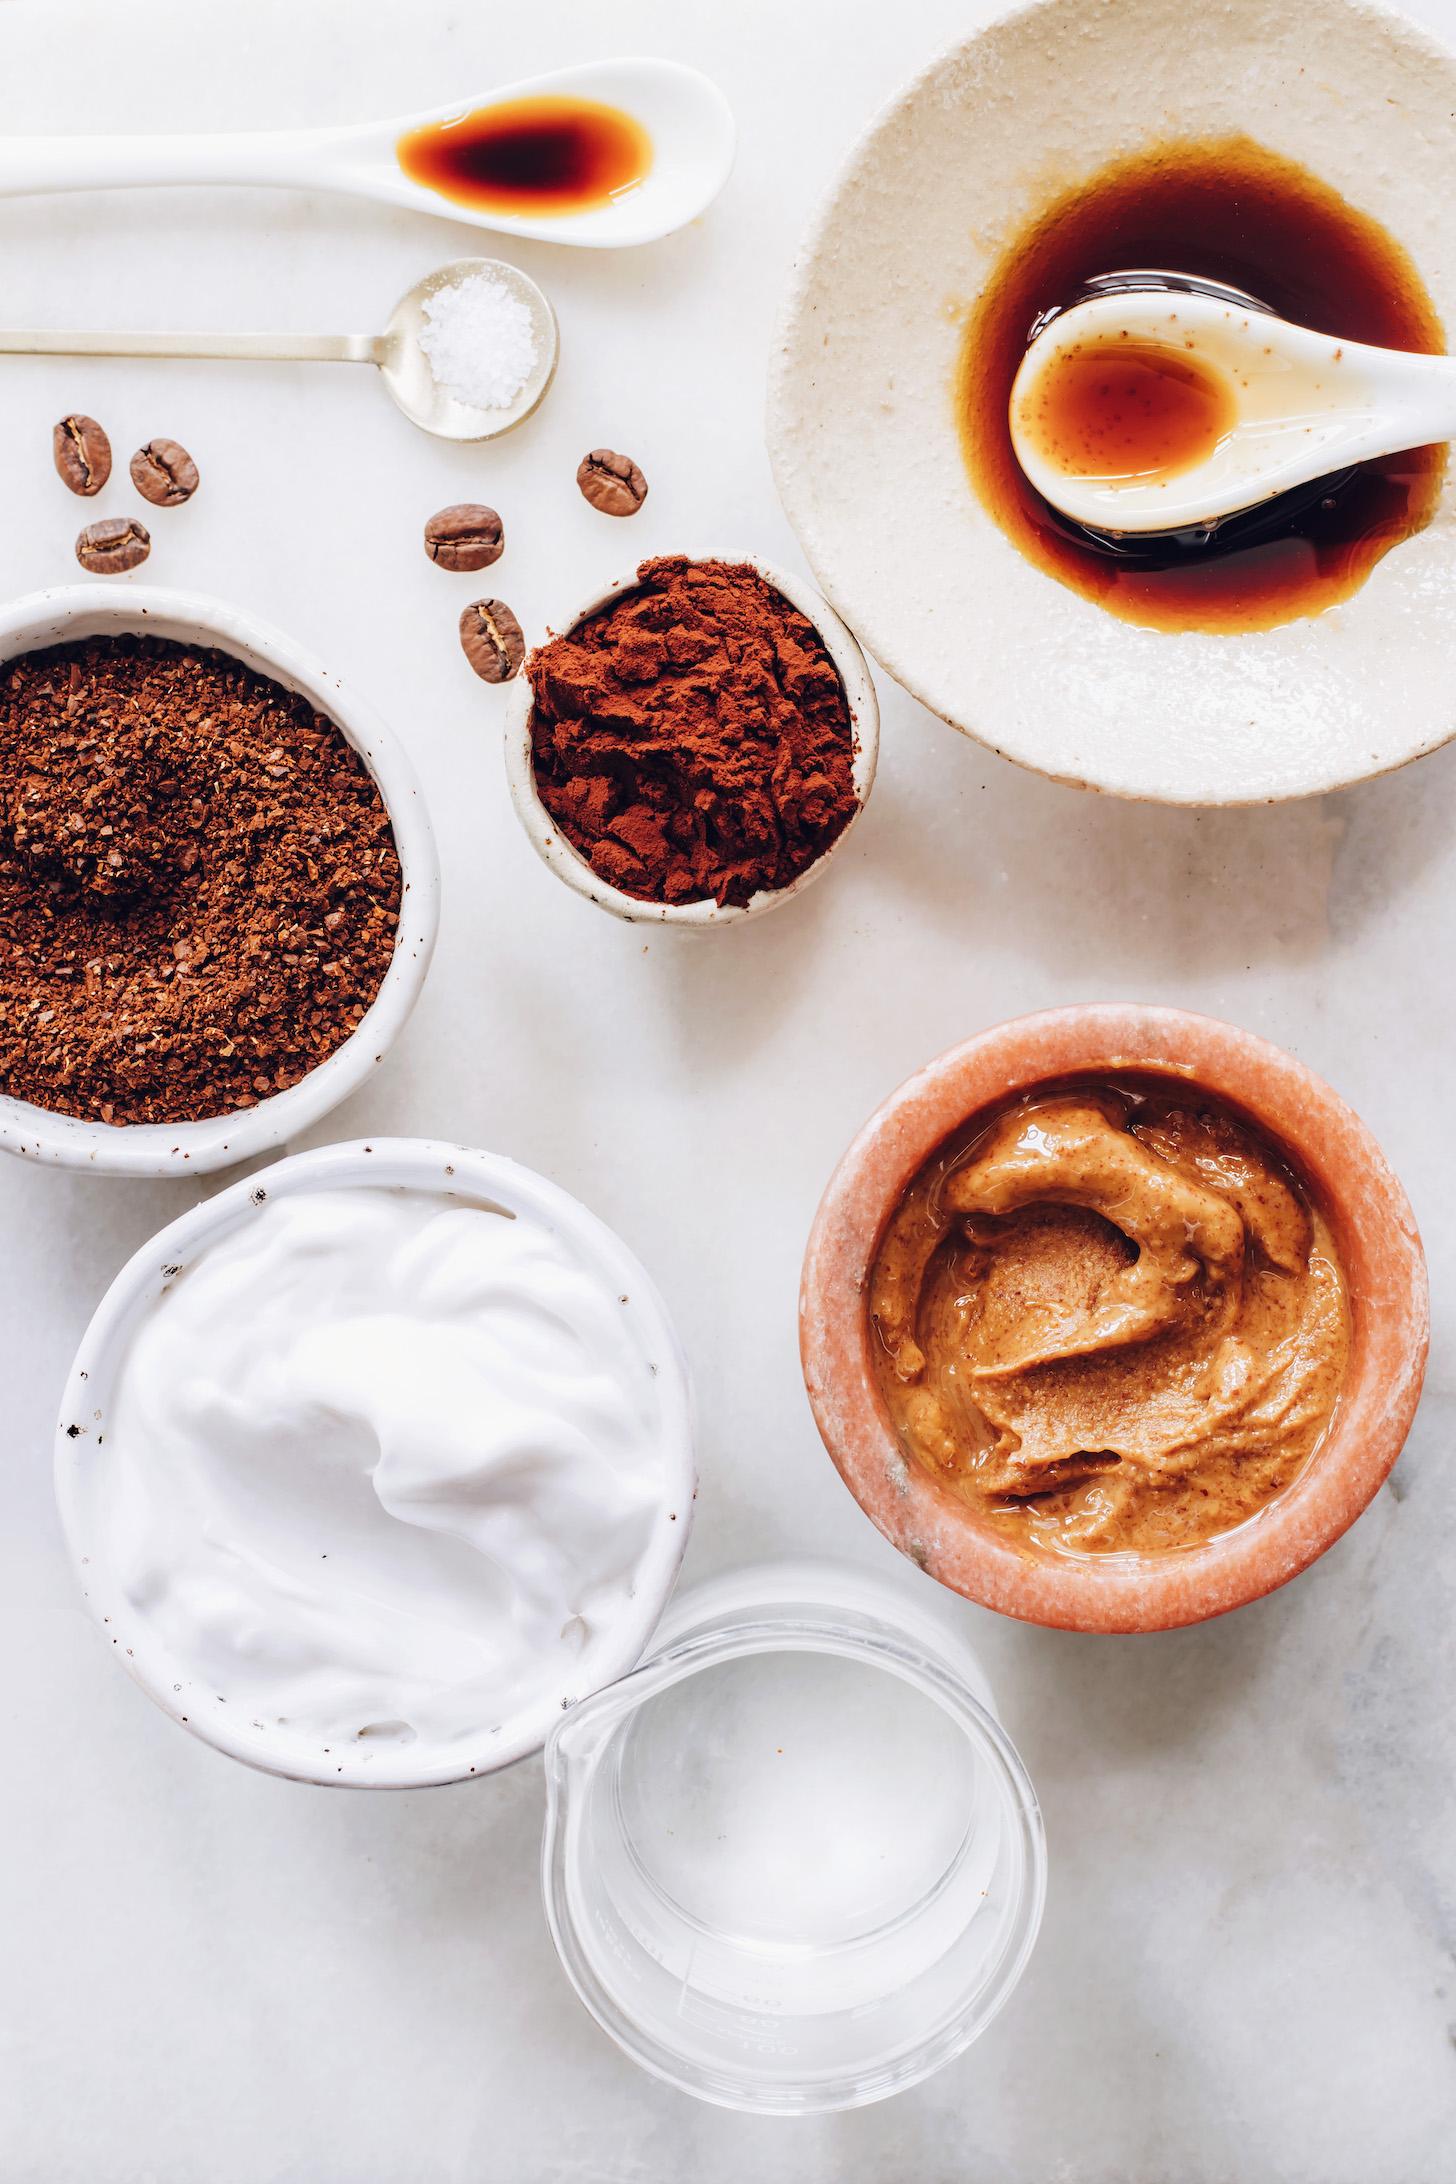 Kahve, kakao tozu, tuz, akçaağaç şurubu, badem yağı, hindistan cevizi sütü ve su